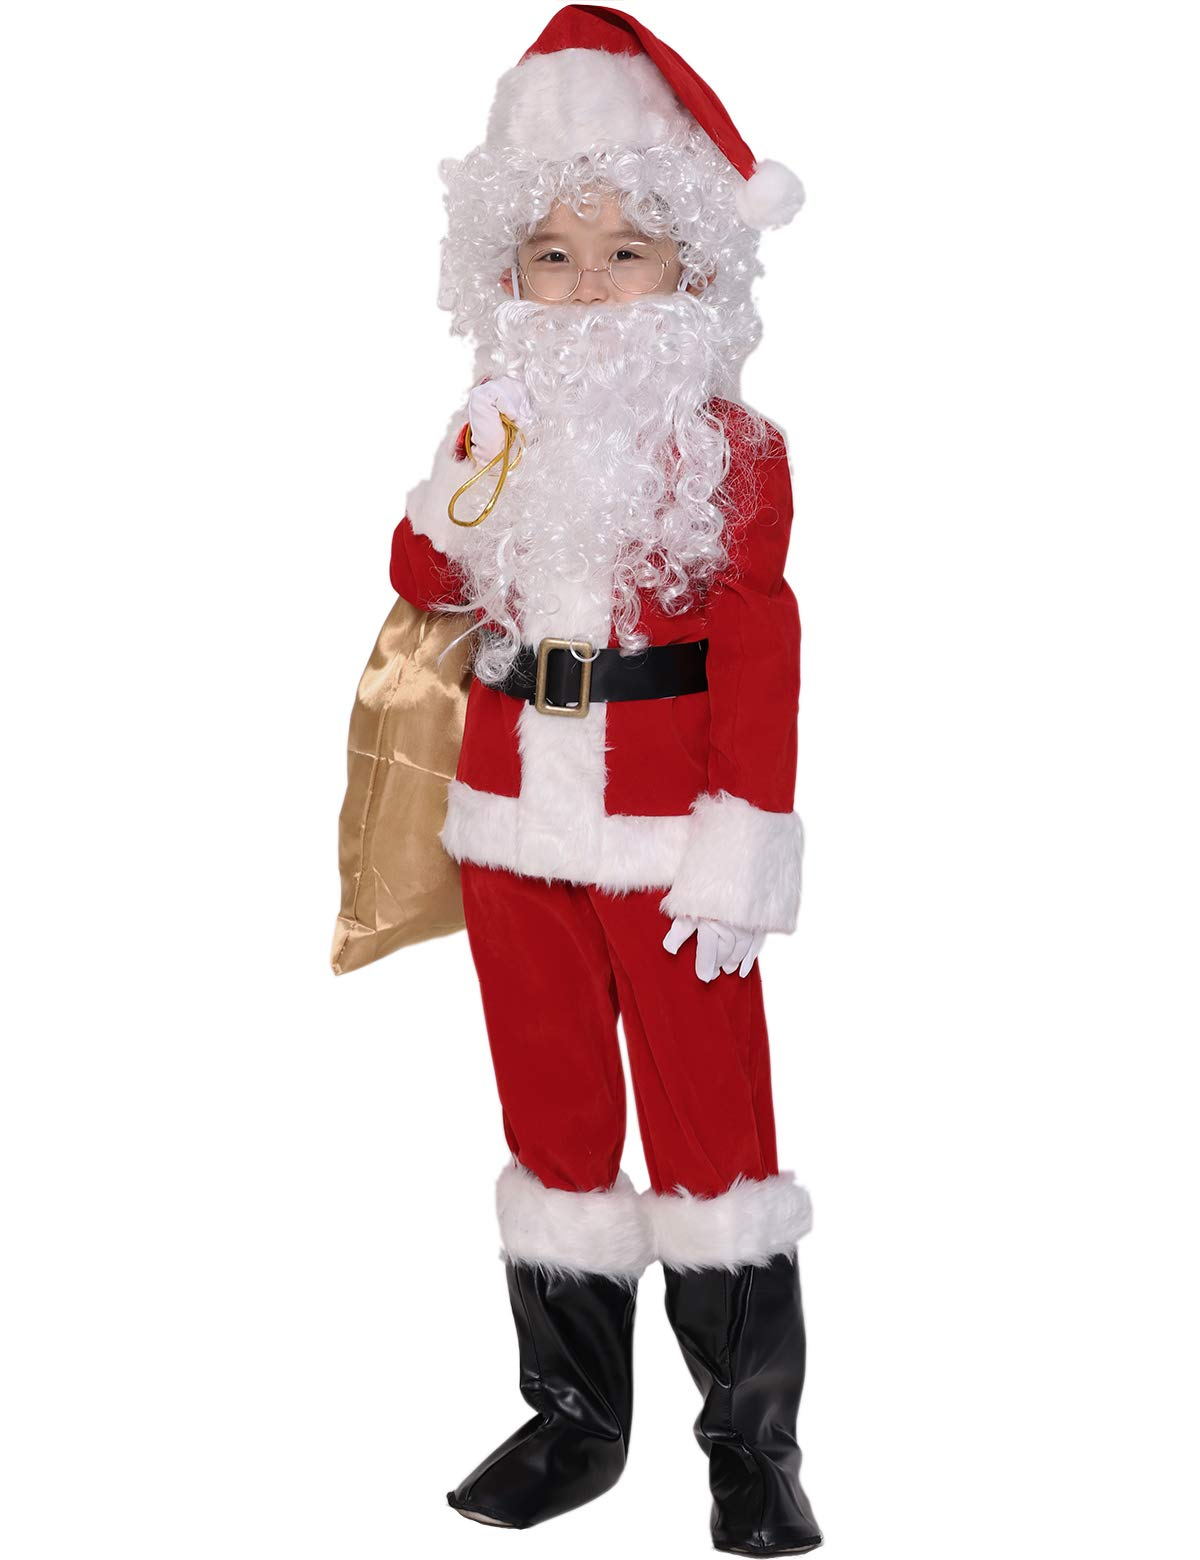 ADOMI Children's Deluxe Santa Suit 10pc. Christmas Child Santa Claus Kids Halloween Costume Cosplay L